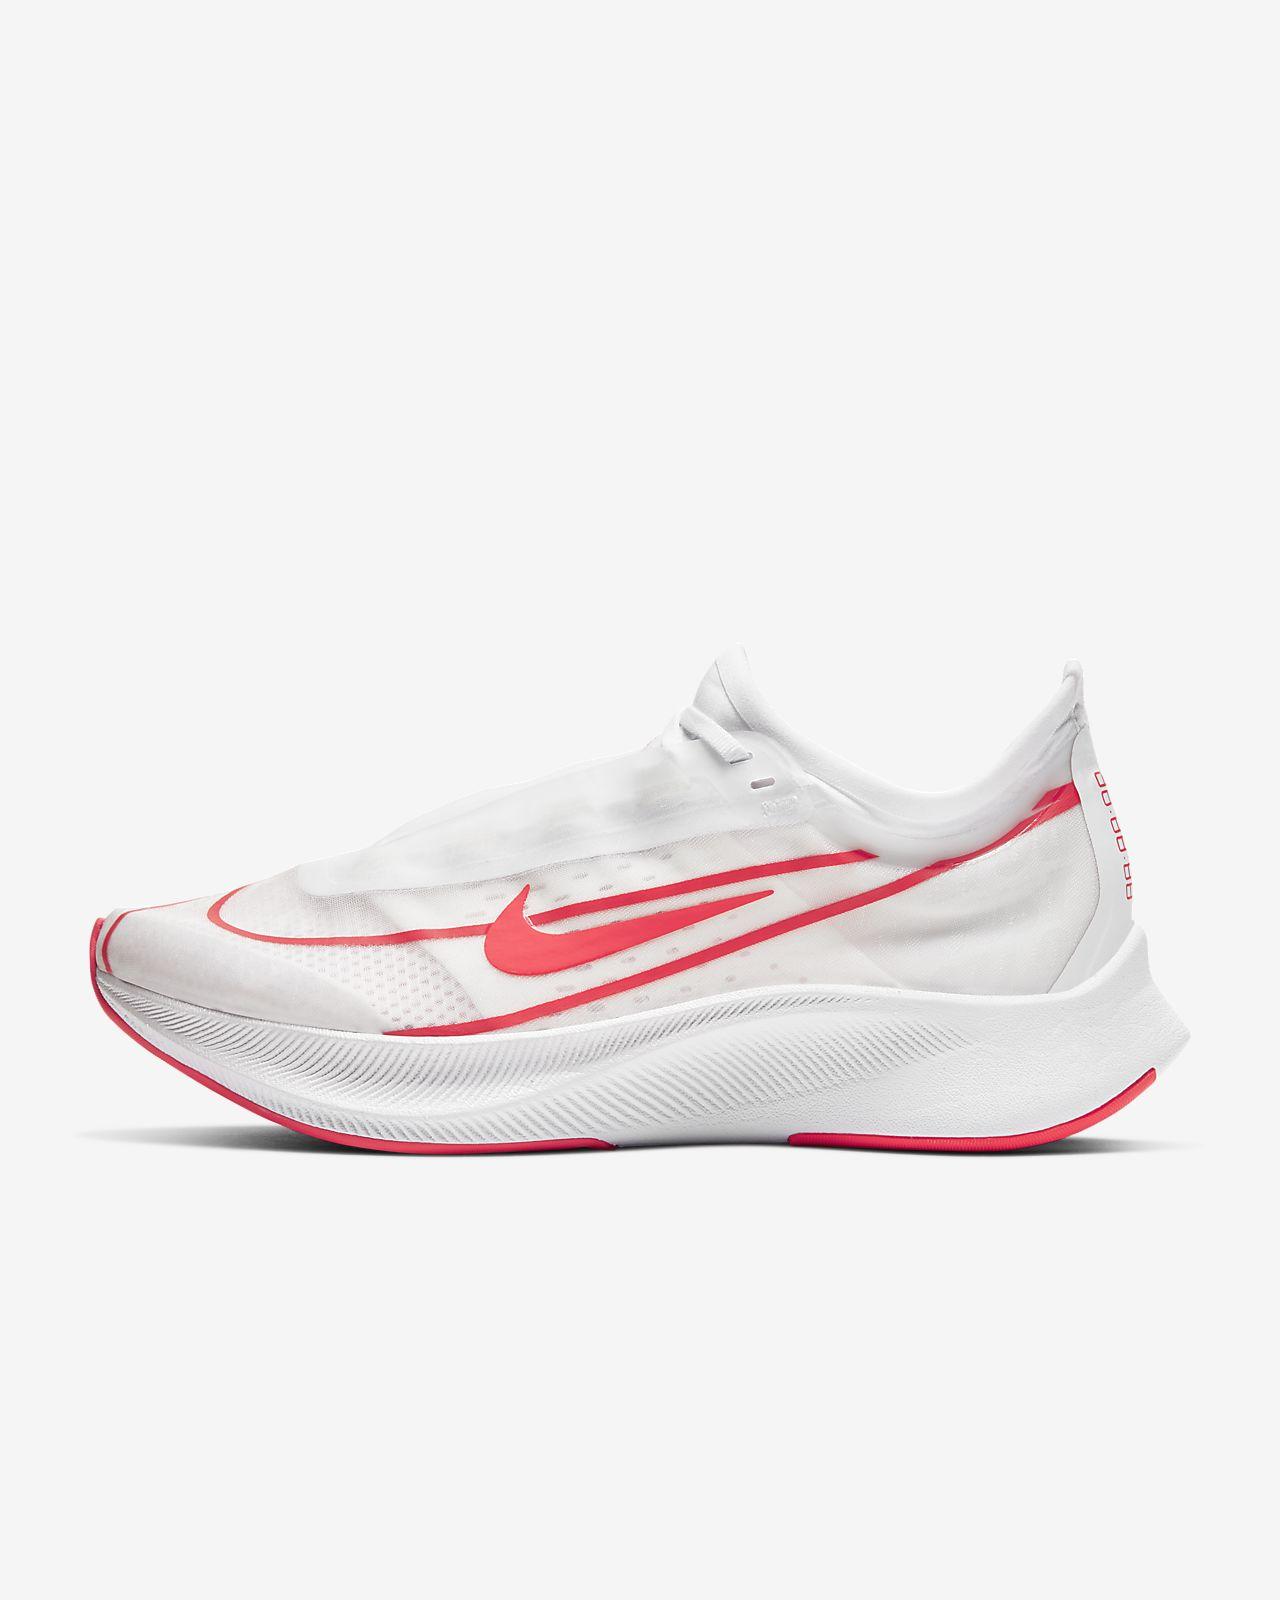 nuovo arrivo Nike Free 3.0 v3 Donna Running Scarpe Di